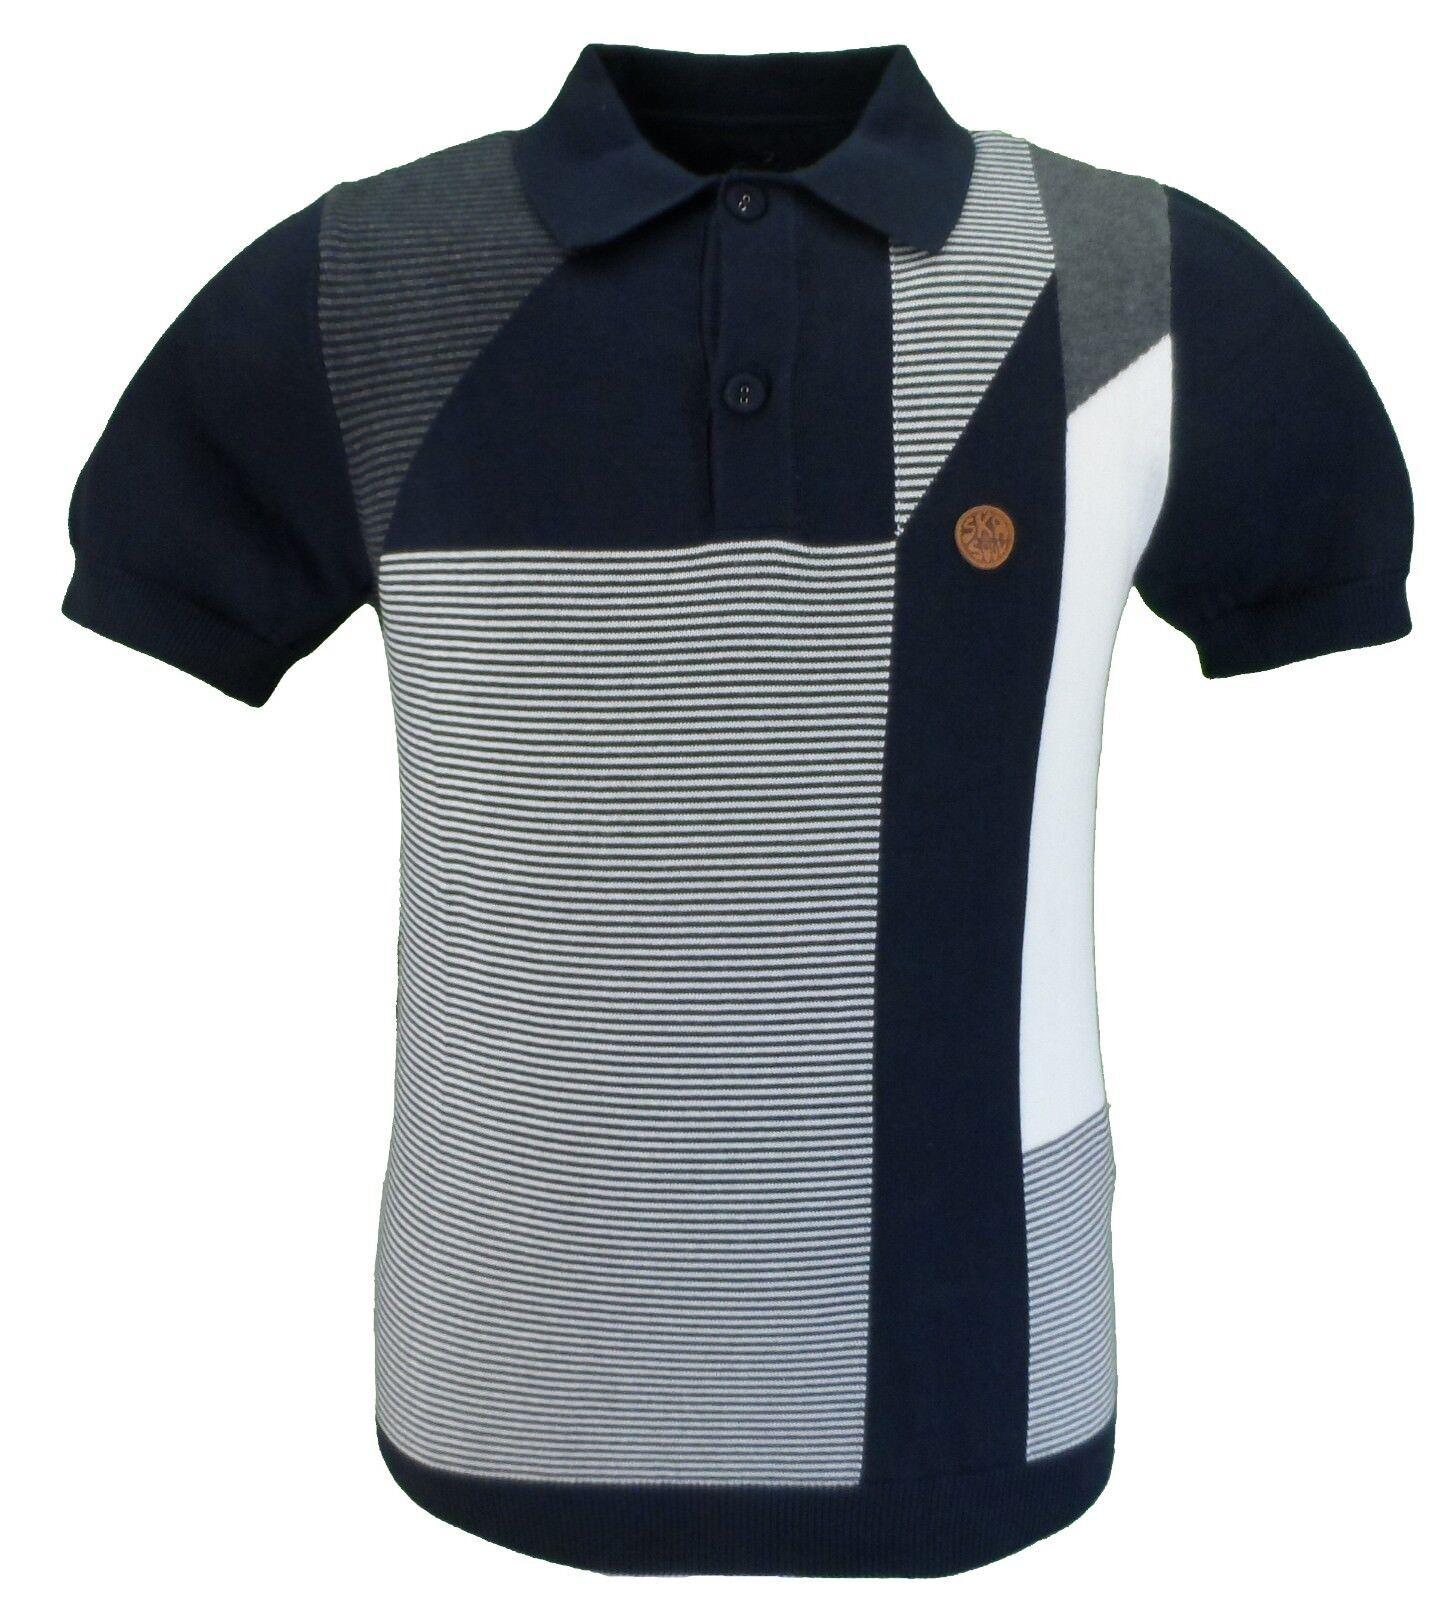 Ska & Soul Navy Panel Fine Gauge Knitted Polo Shirt